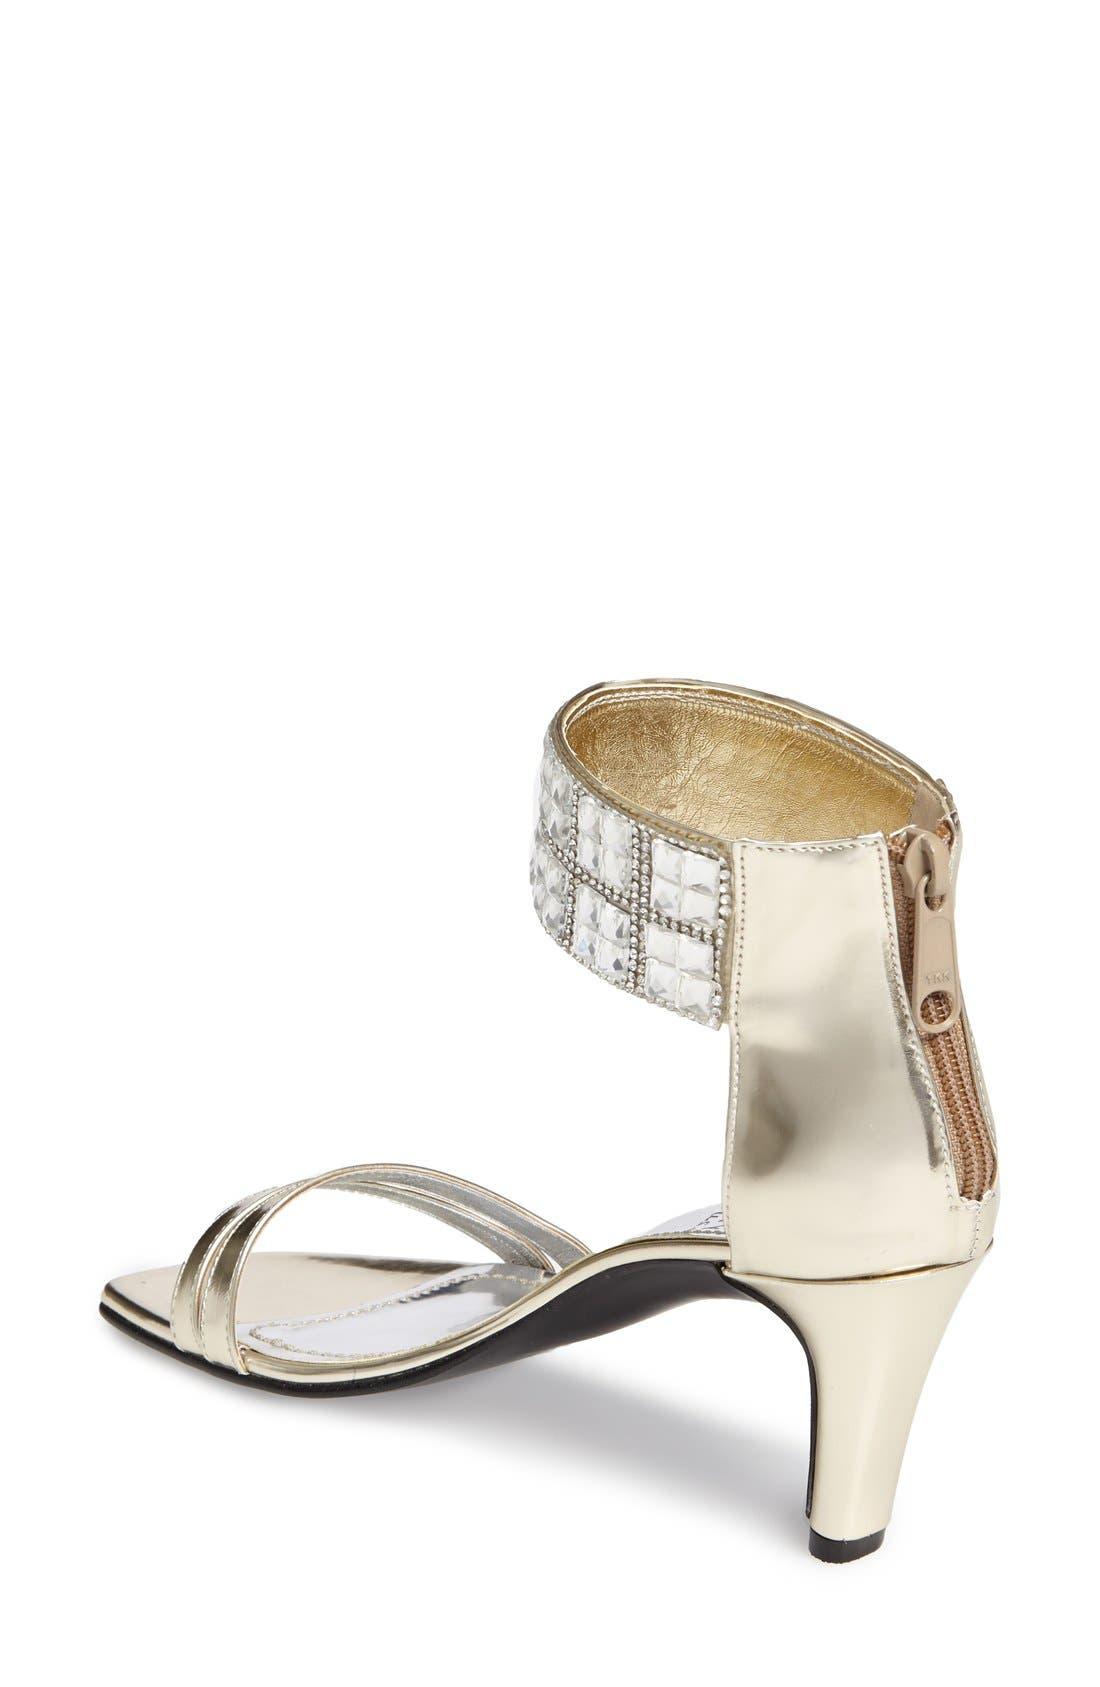 Scarlett Crystal Embellished Evening Sandal,                             Alternate thumbnail 6, color,                             PLATINUM FAUX LEATHER